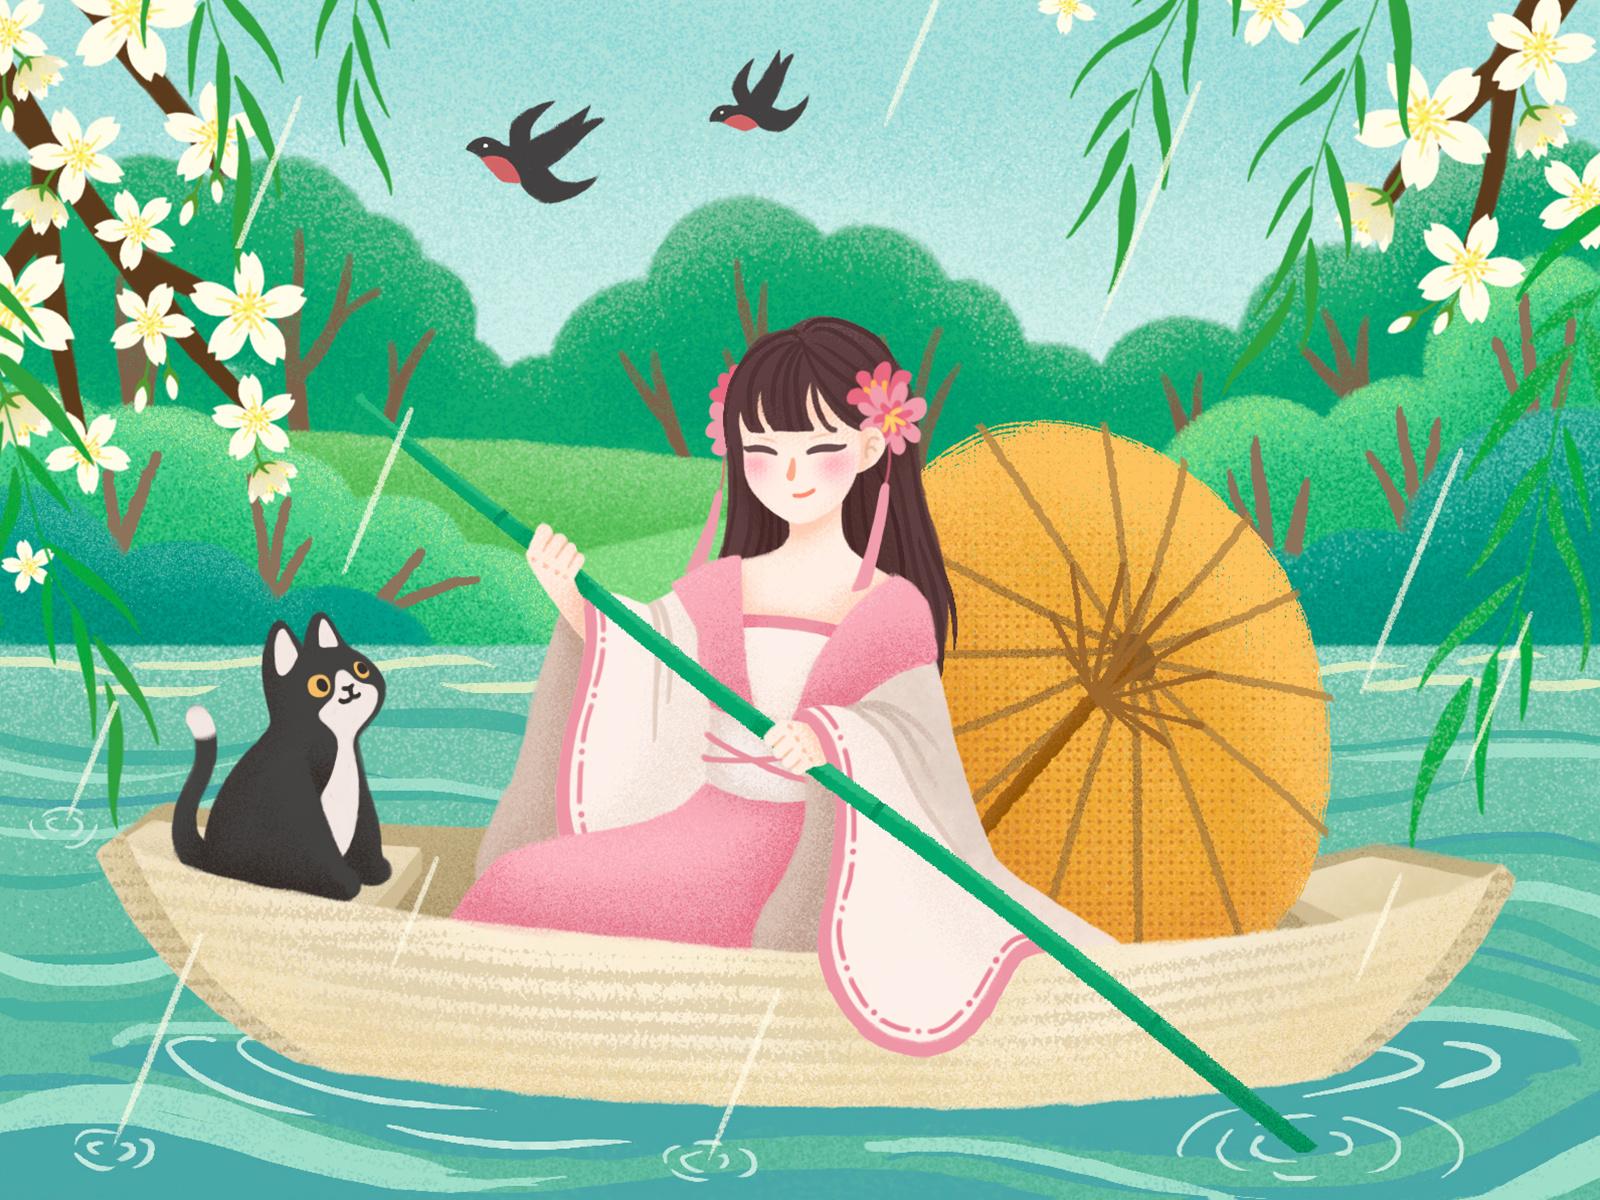 Cat Illustrations - Qingming Festival. Art by ZJR